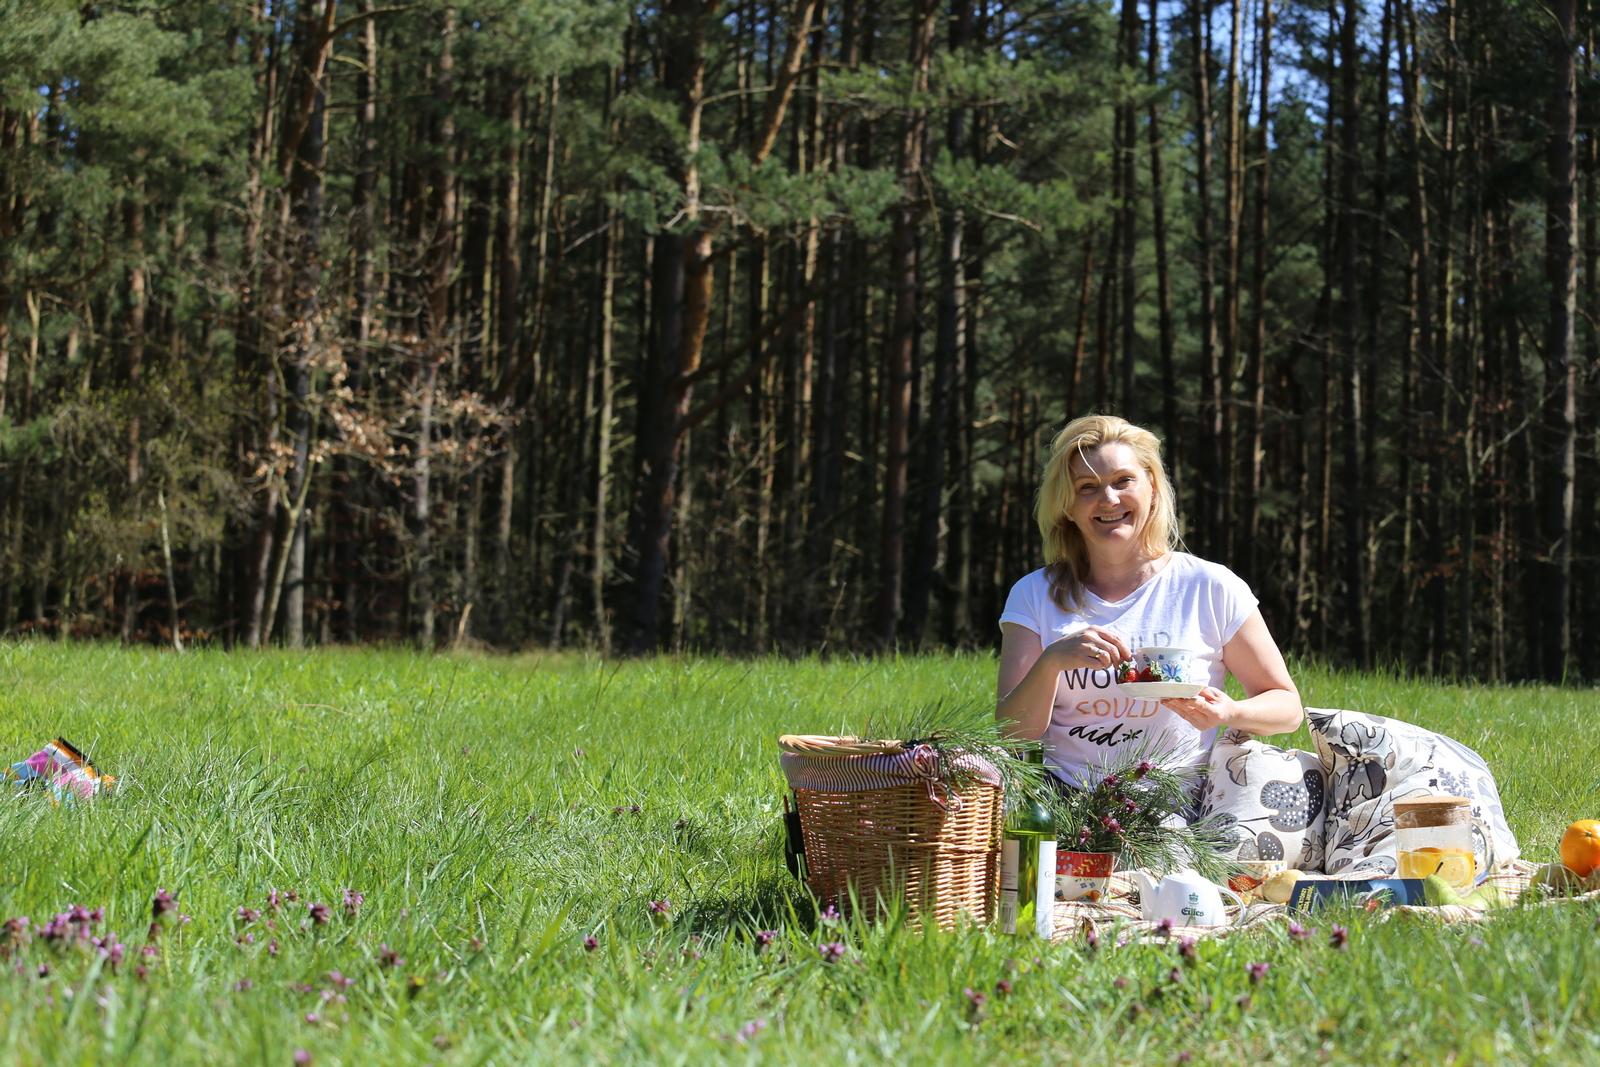 pikniki w lesie